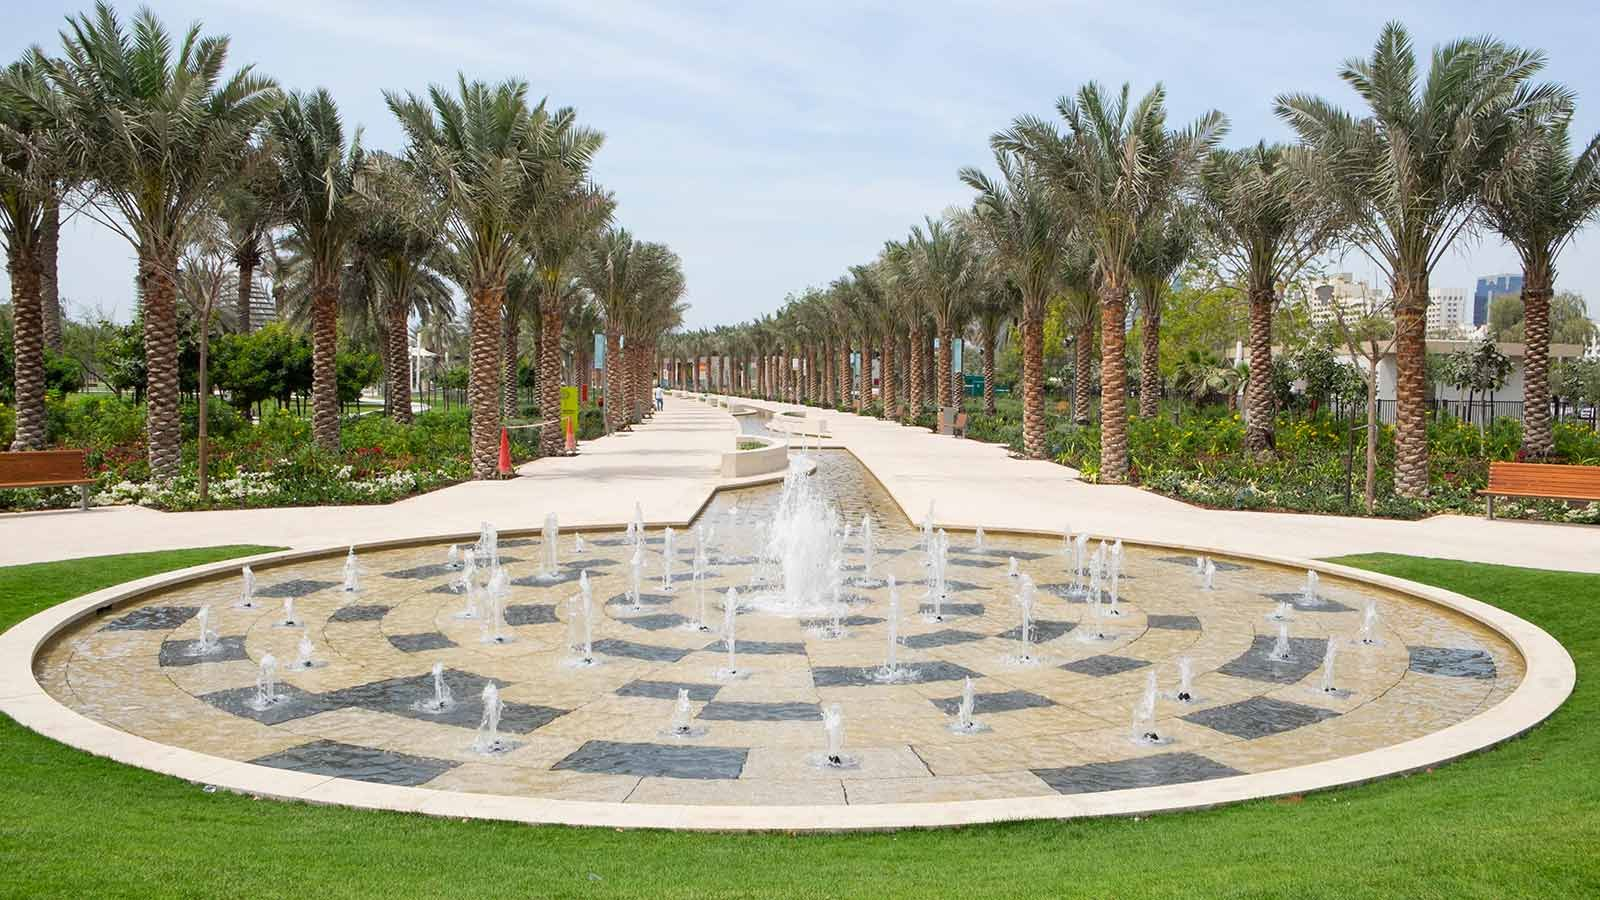 Fountains at Umm Al Emarat Park - Mace Group